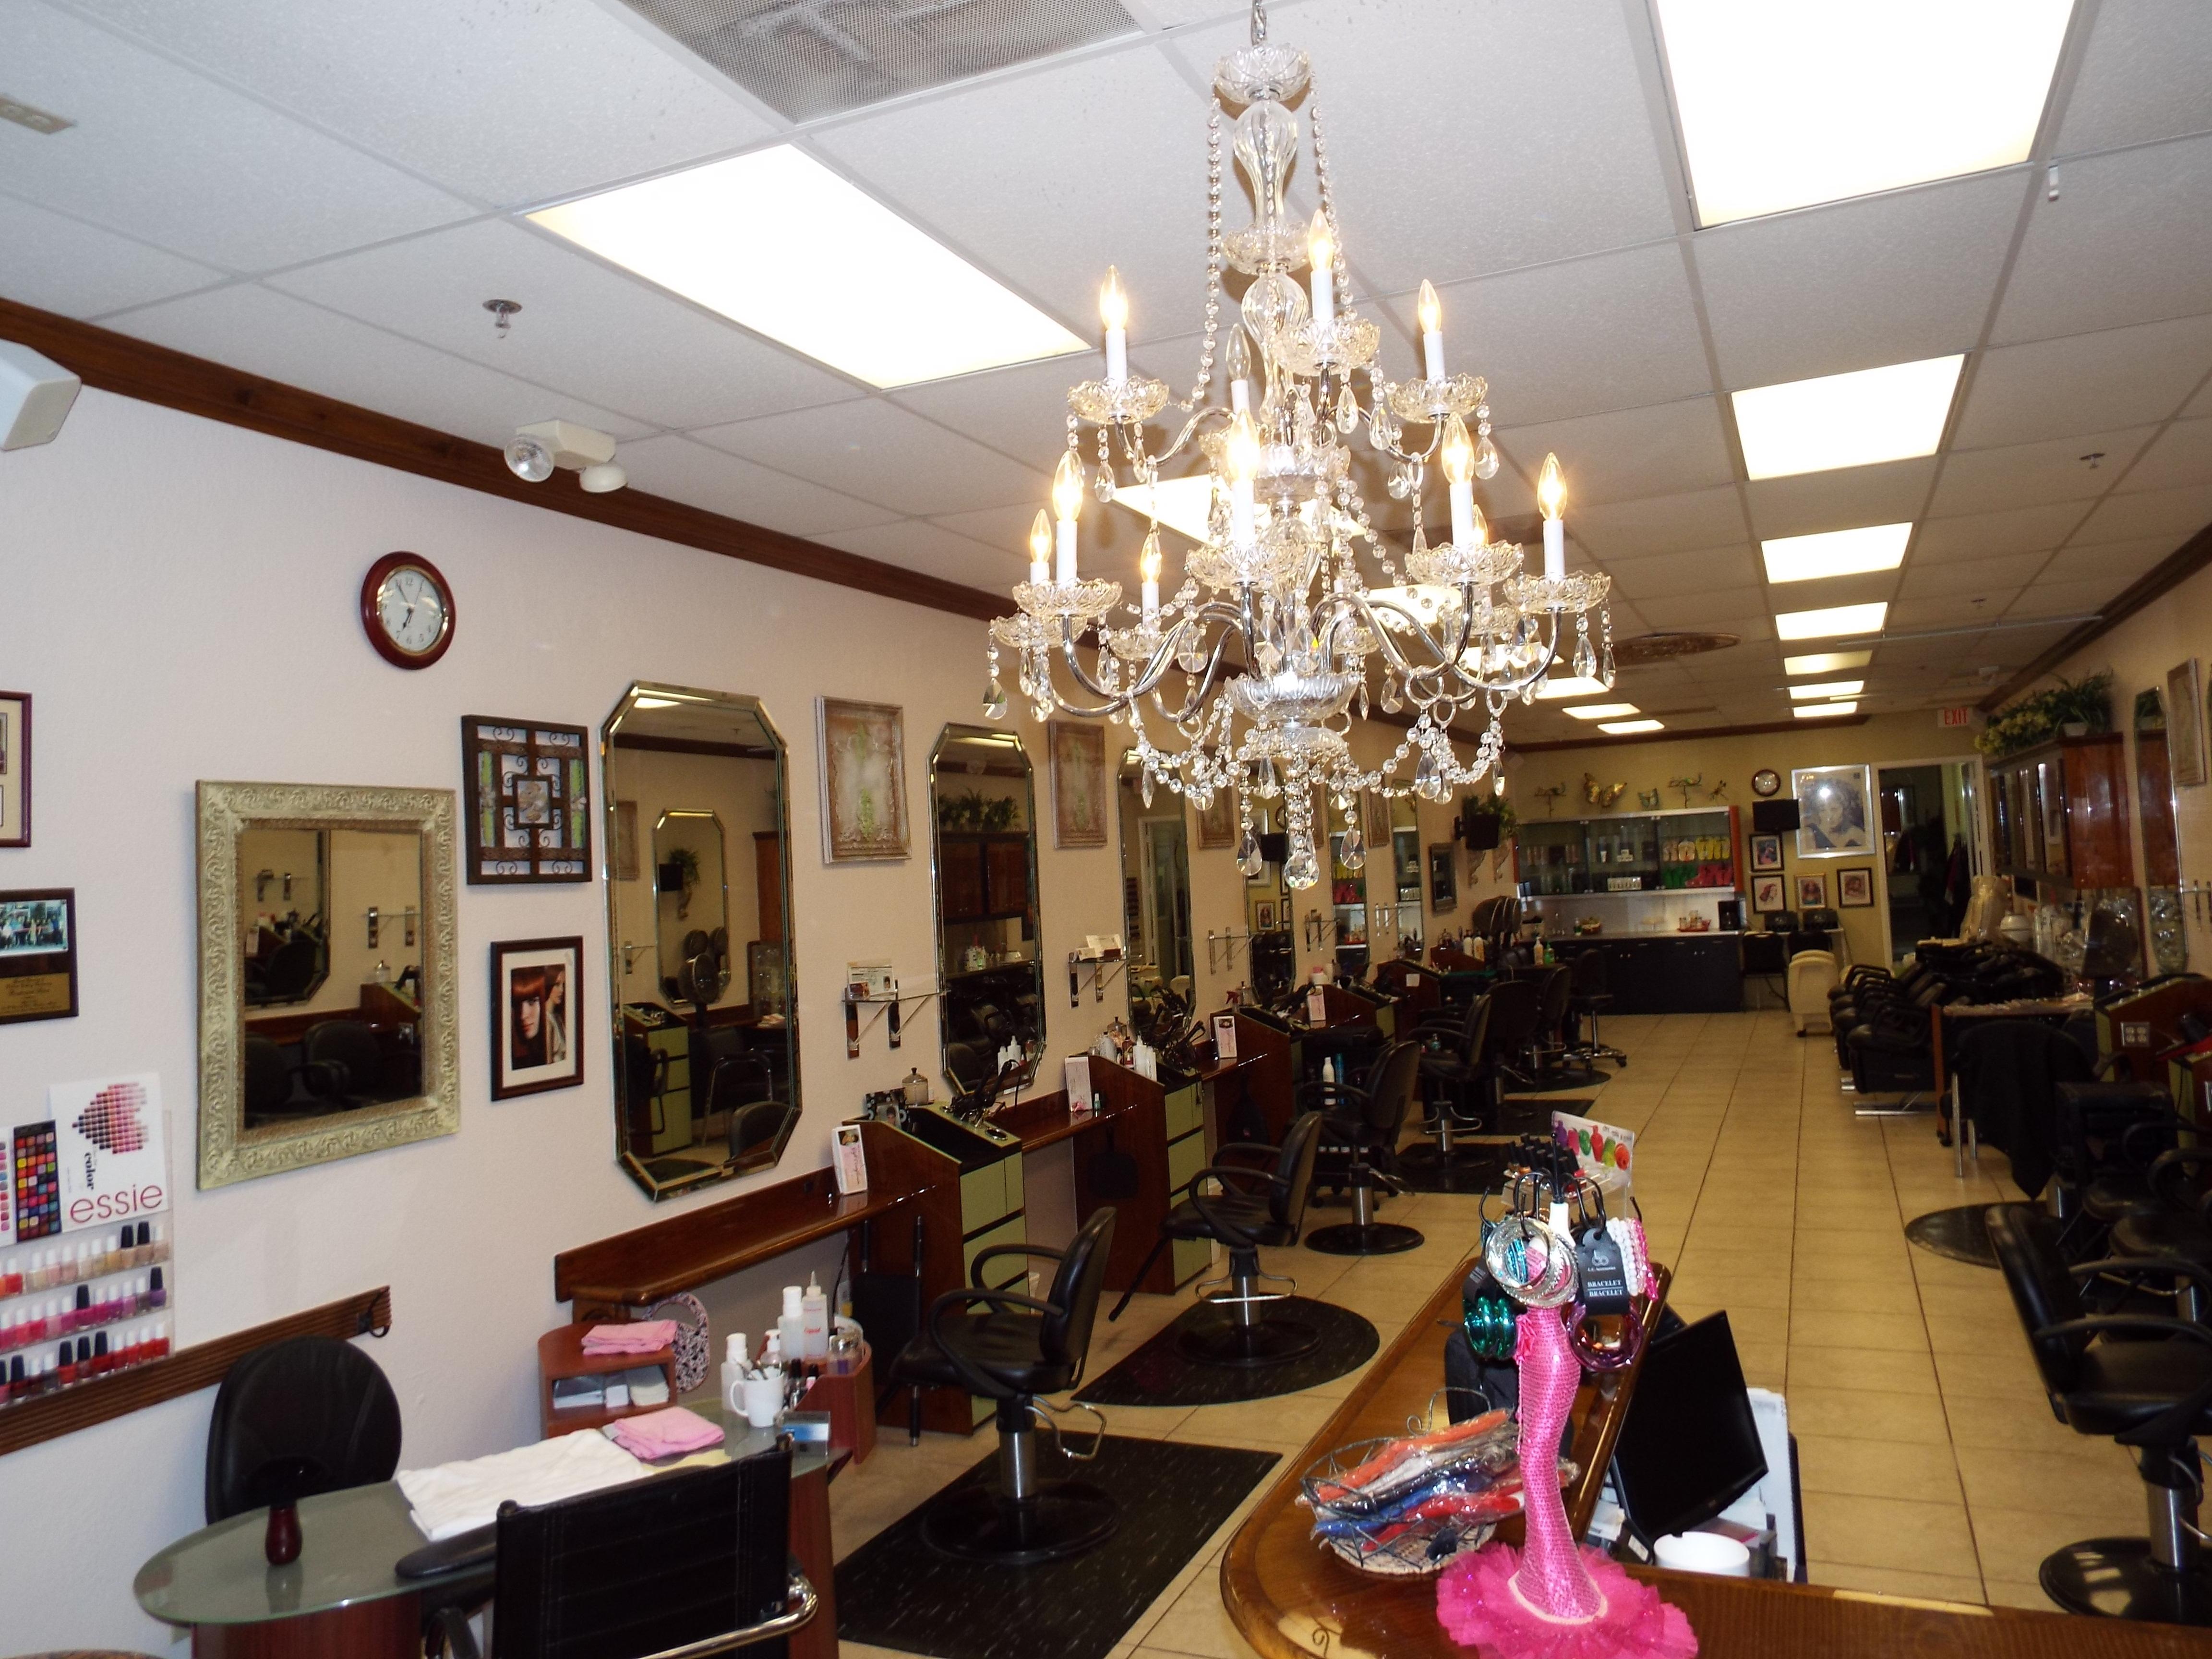 Boulevard Salon image 3